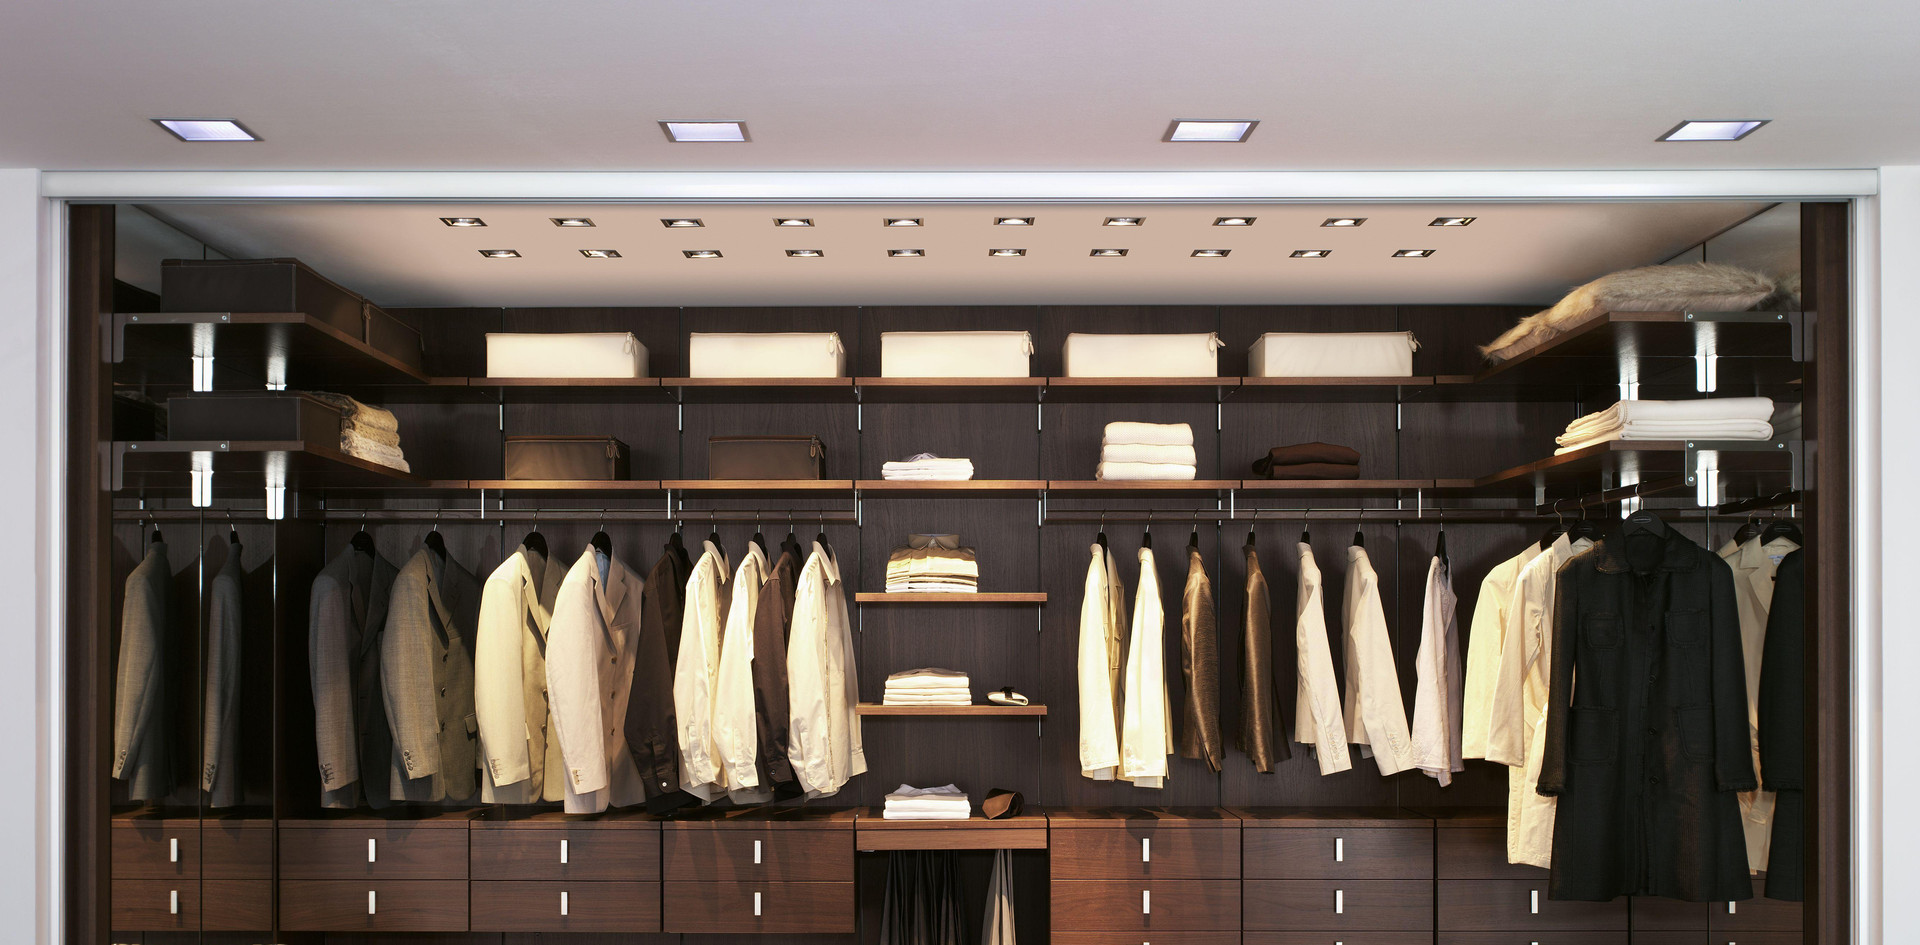 Motte walk in Wardrobe in Thermostructur